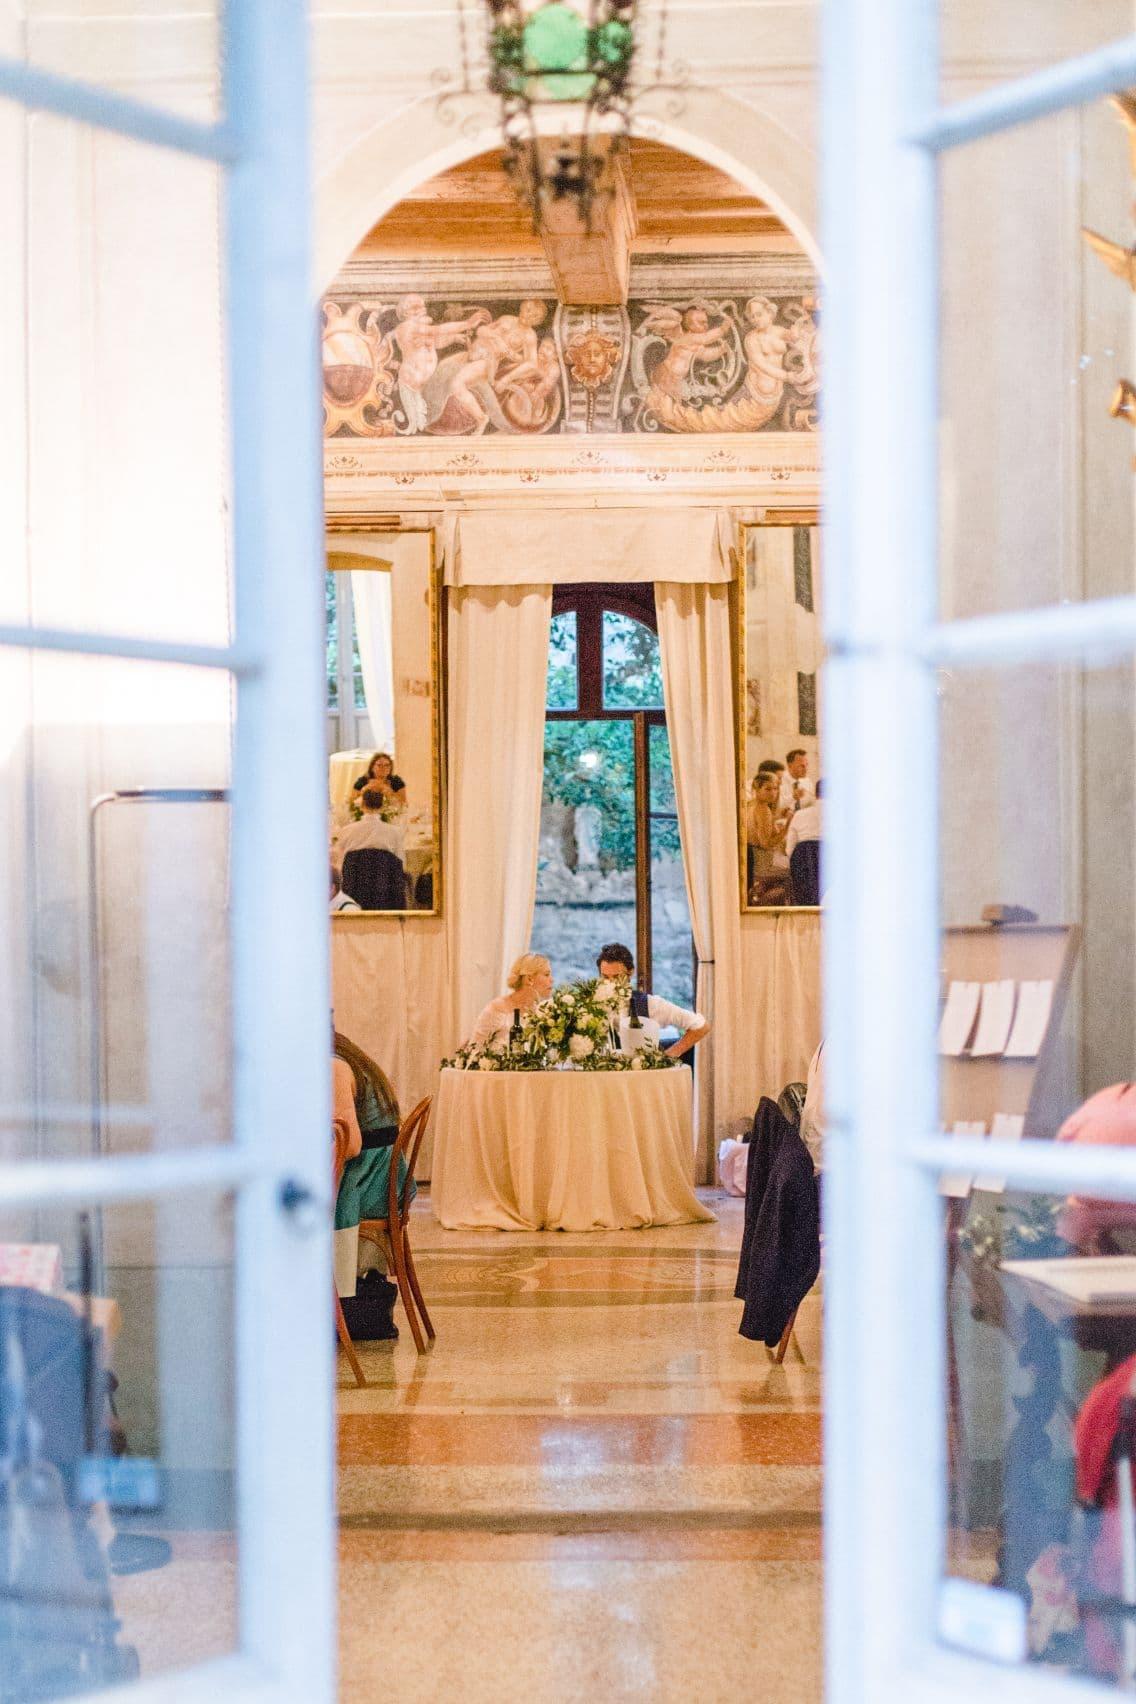 Million Memories_A&D_Hochzeitsfotograf_Schlosshochzeit_Toskana_Lago Di Como_Wedding_Tuscany_171